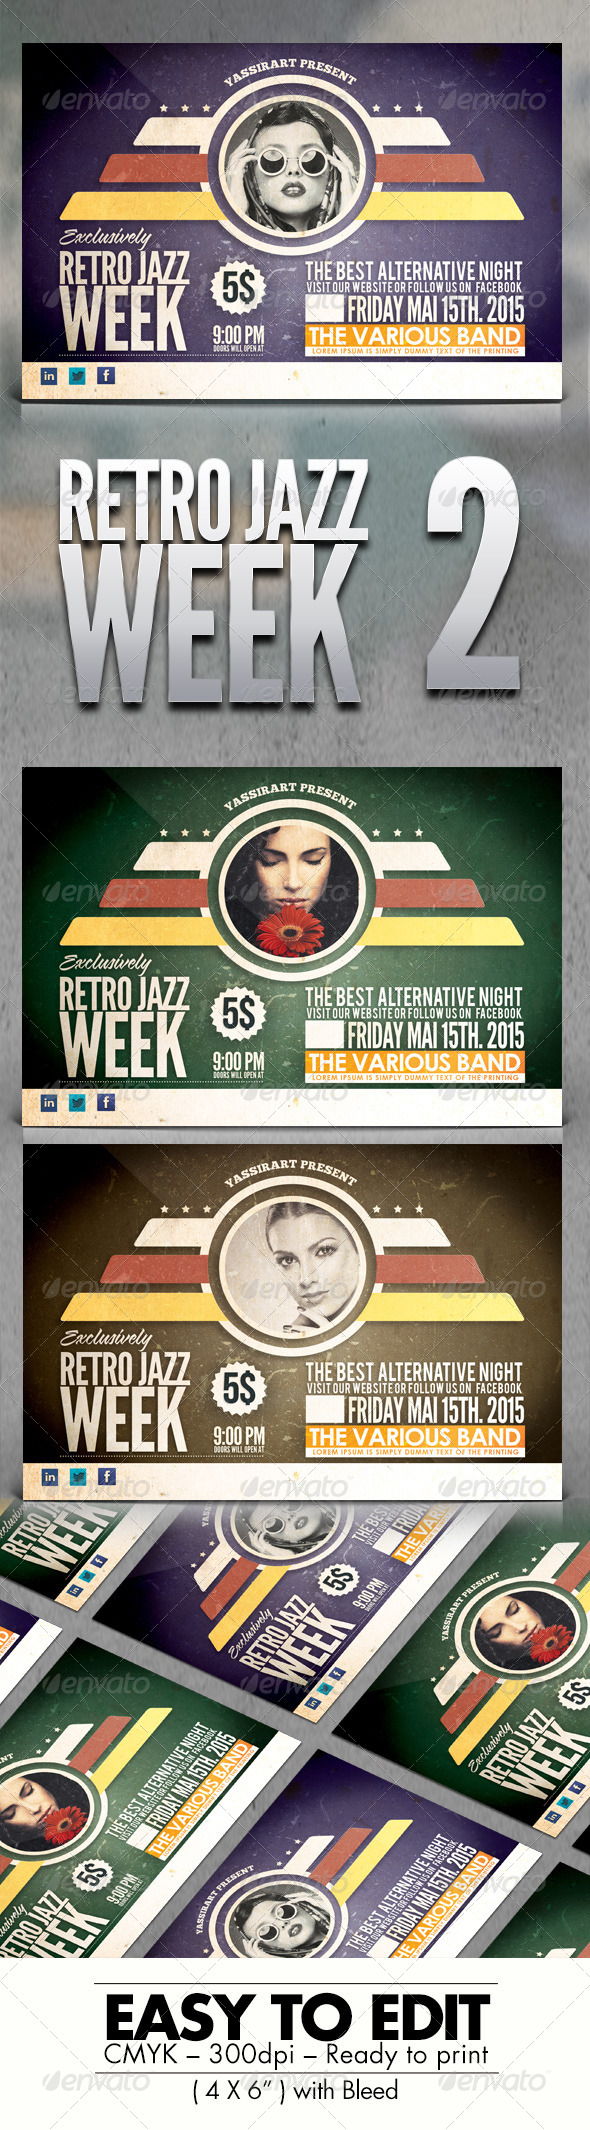 GraphicRiver Retro Jazz Week V2 7774628